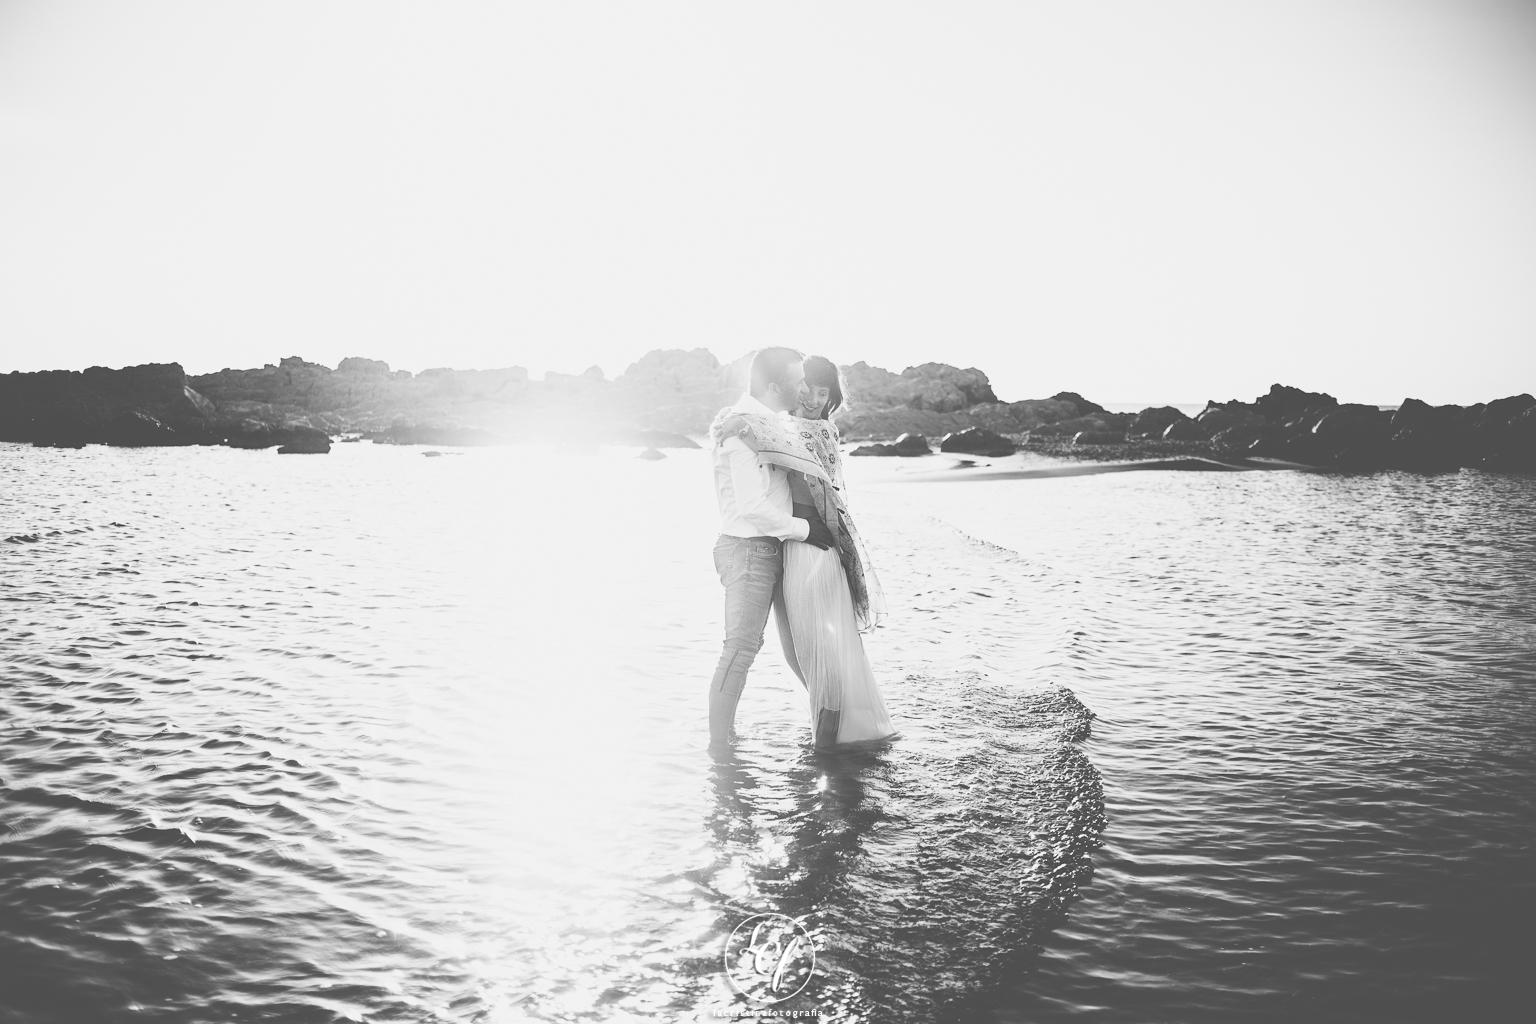 fotografia preboda costa brava :: empúries :: amanecer :: fotografía de pareja :: fotógrafo de pareja :: reportaje de preboda :: reportaje en la playa